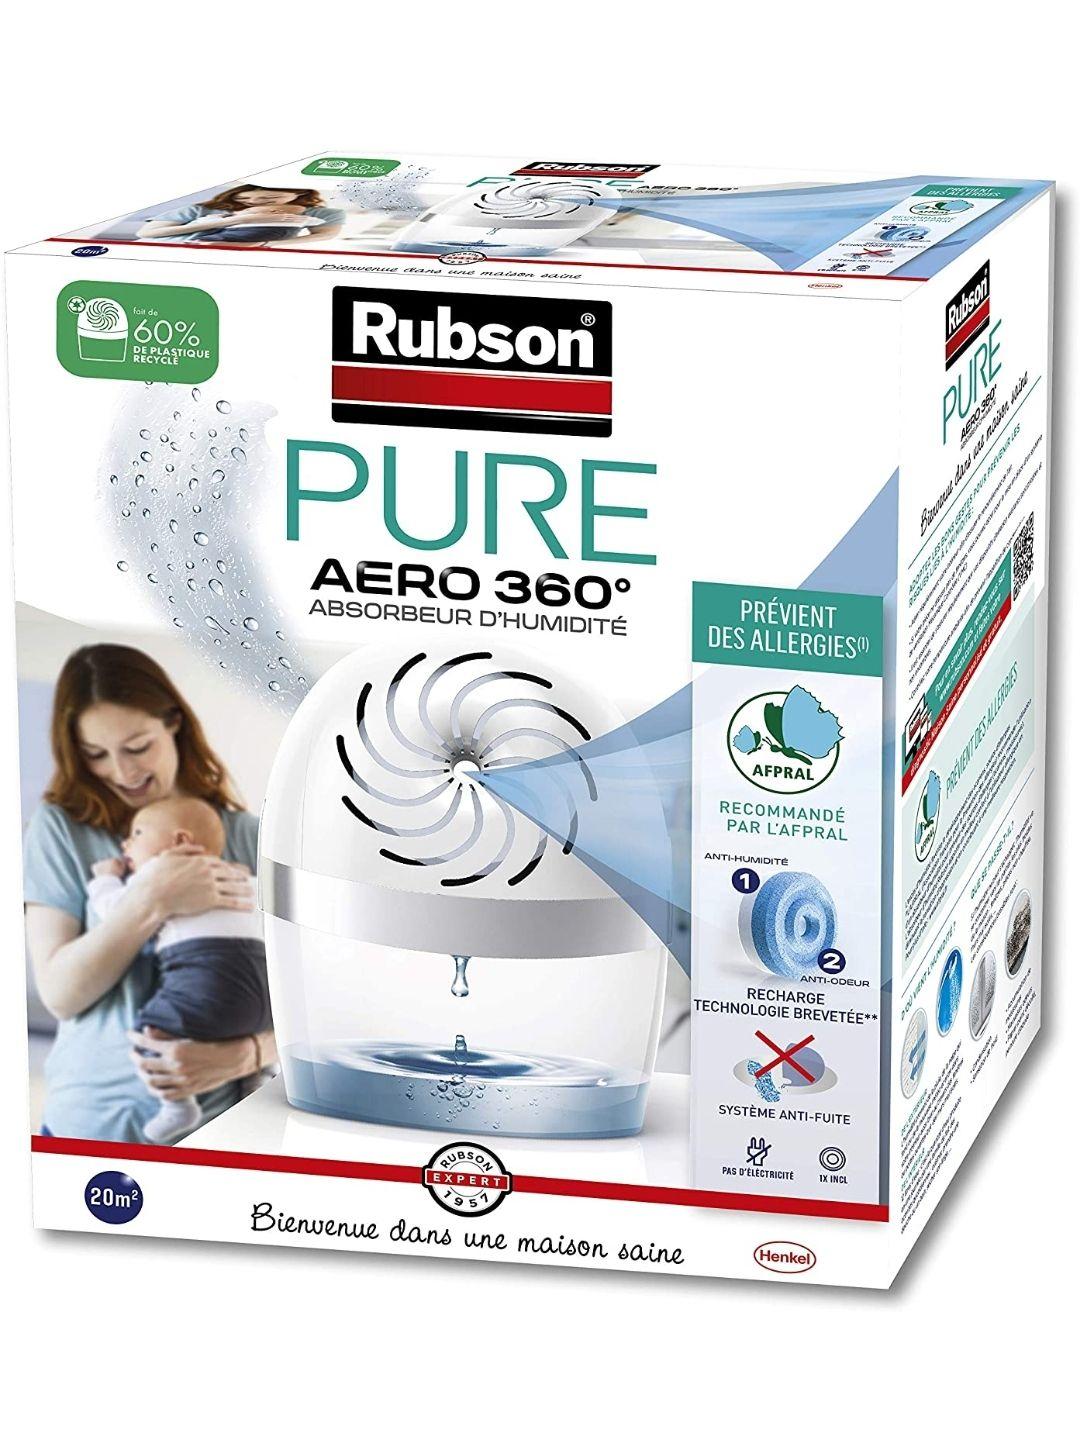 [Prime] Absorbeur d'humidité Rubson Aero 360